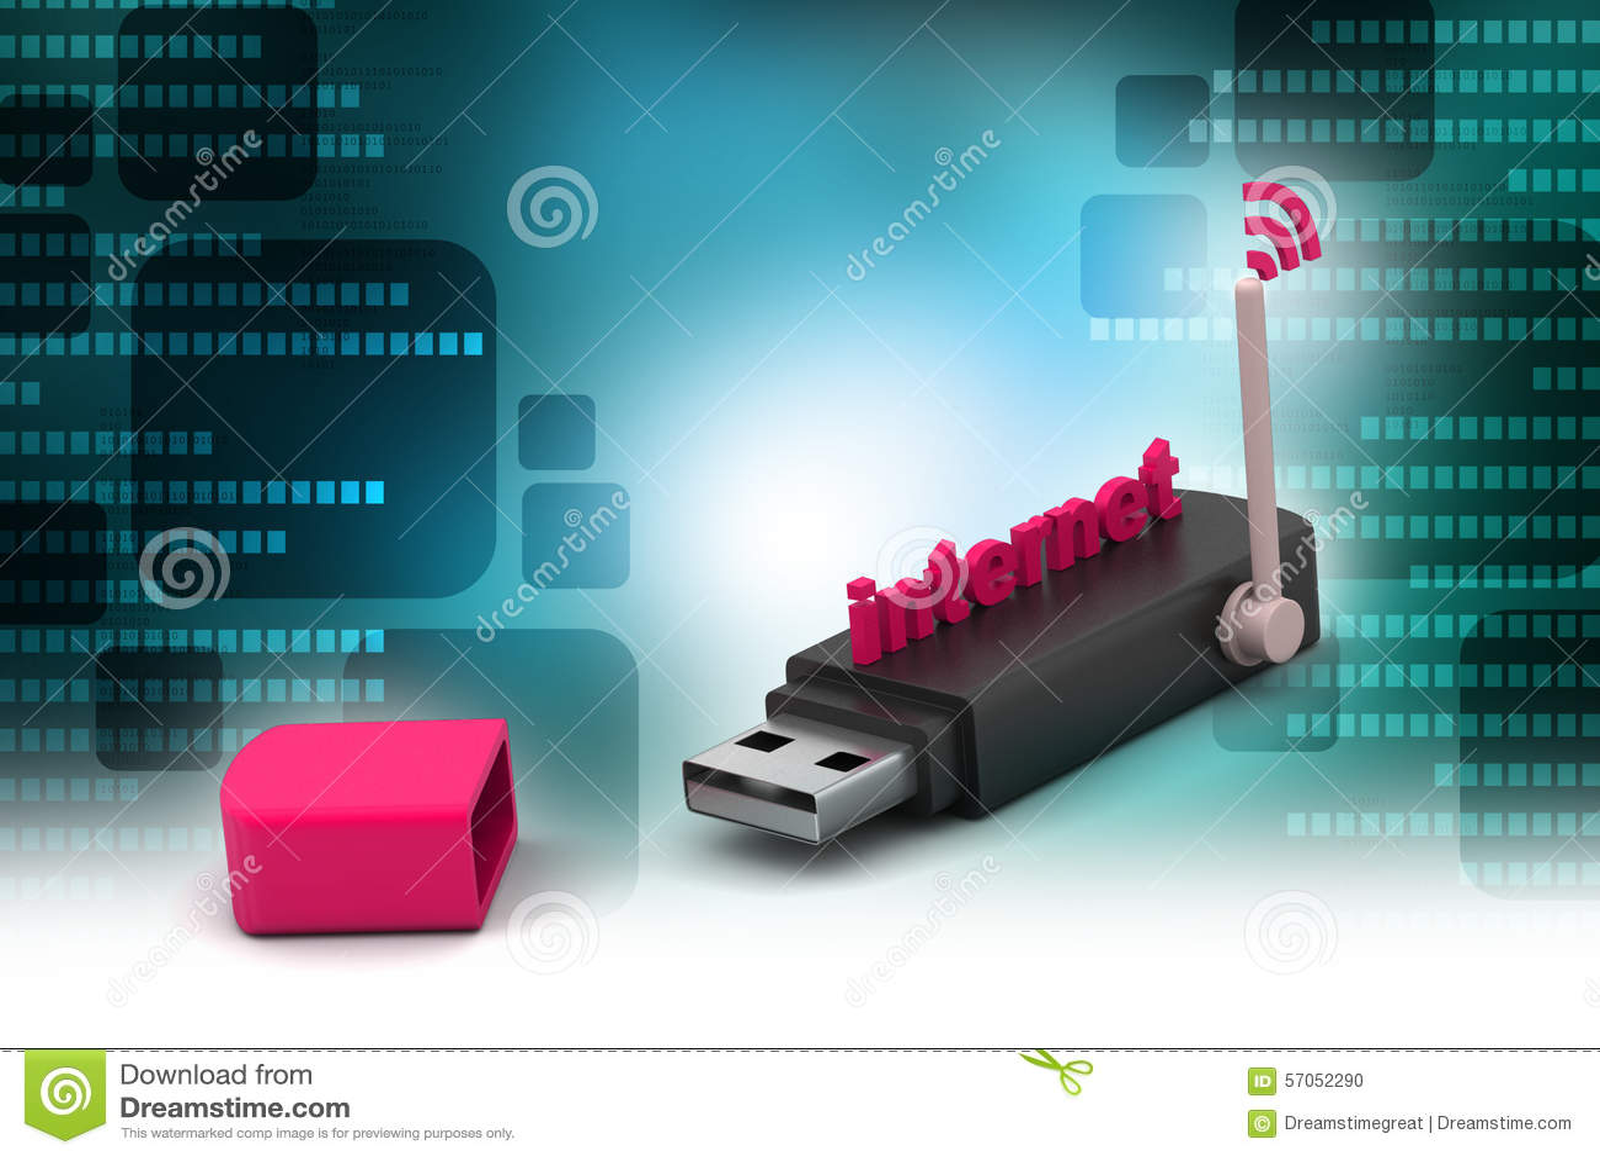 Usb met Internet-verbinding